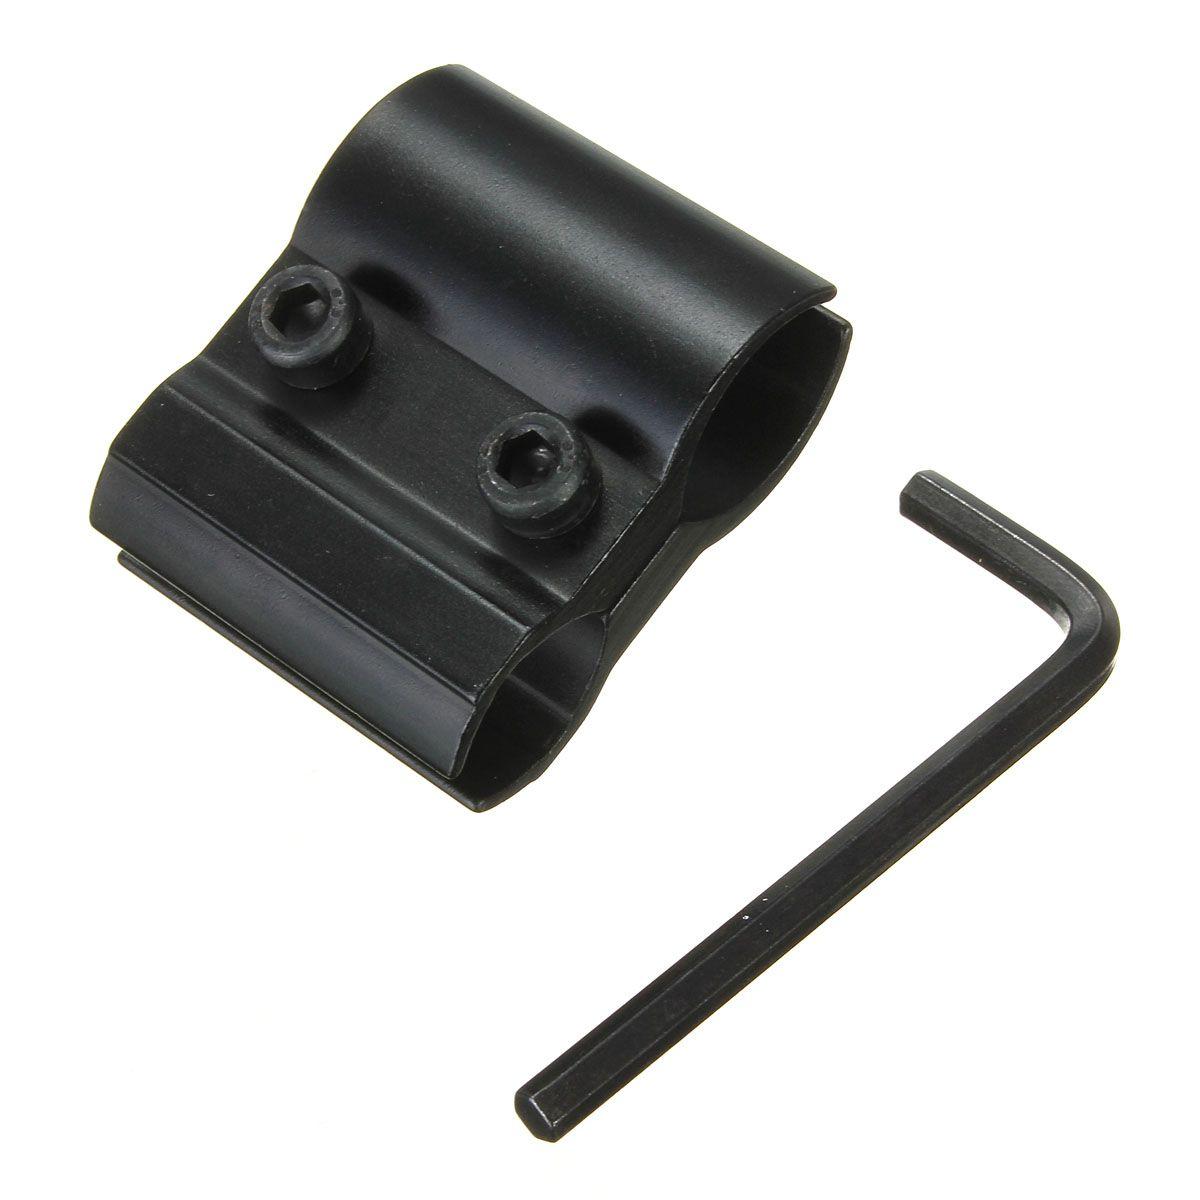 Black Tactical Barrel Ring Scope Clamp Mount Holder Flashlight Torch Laser Sight